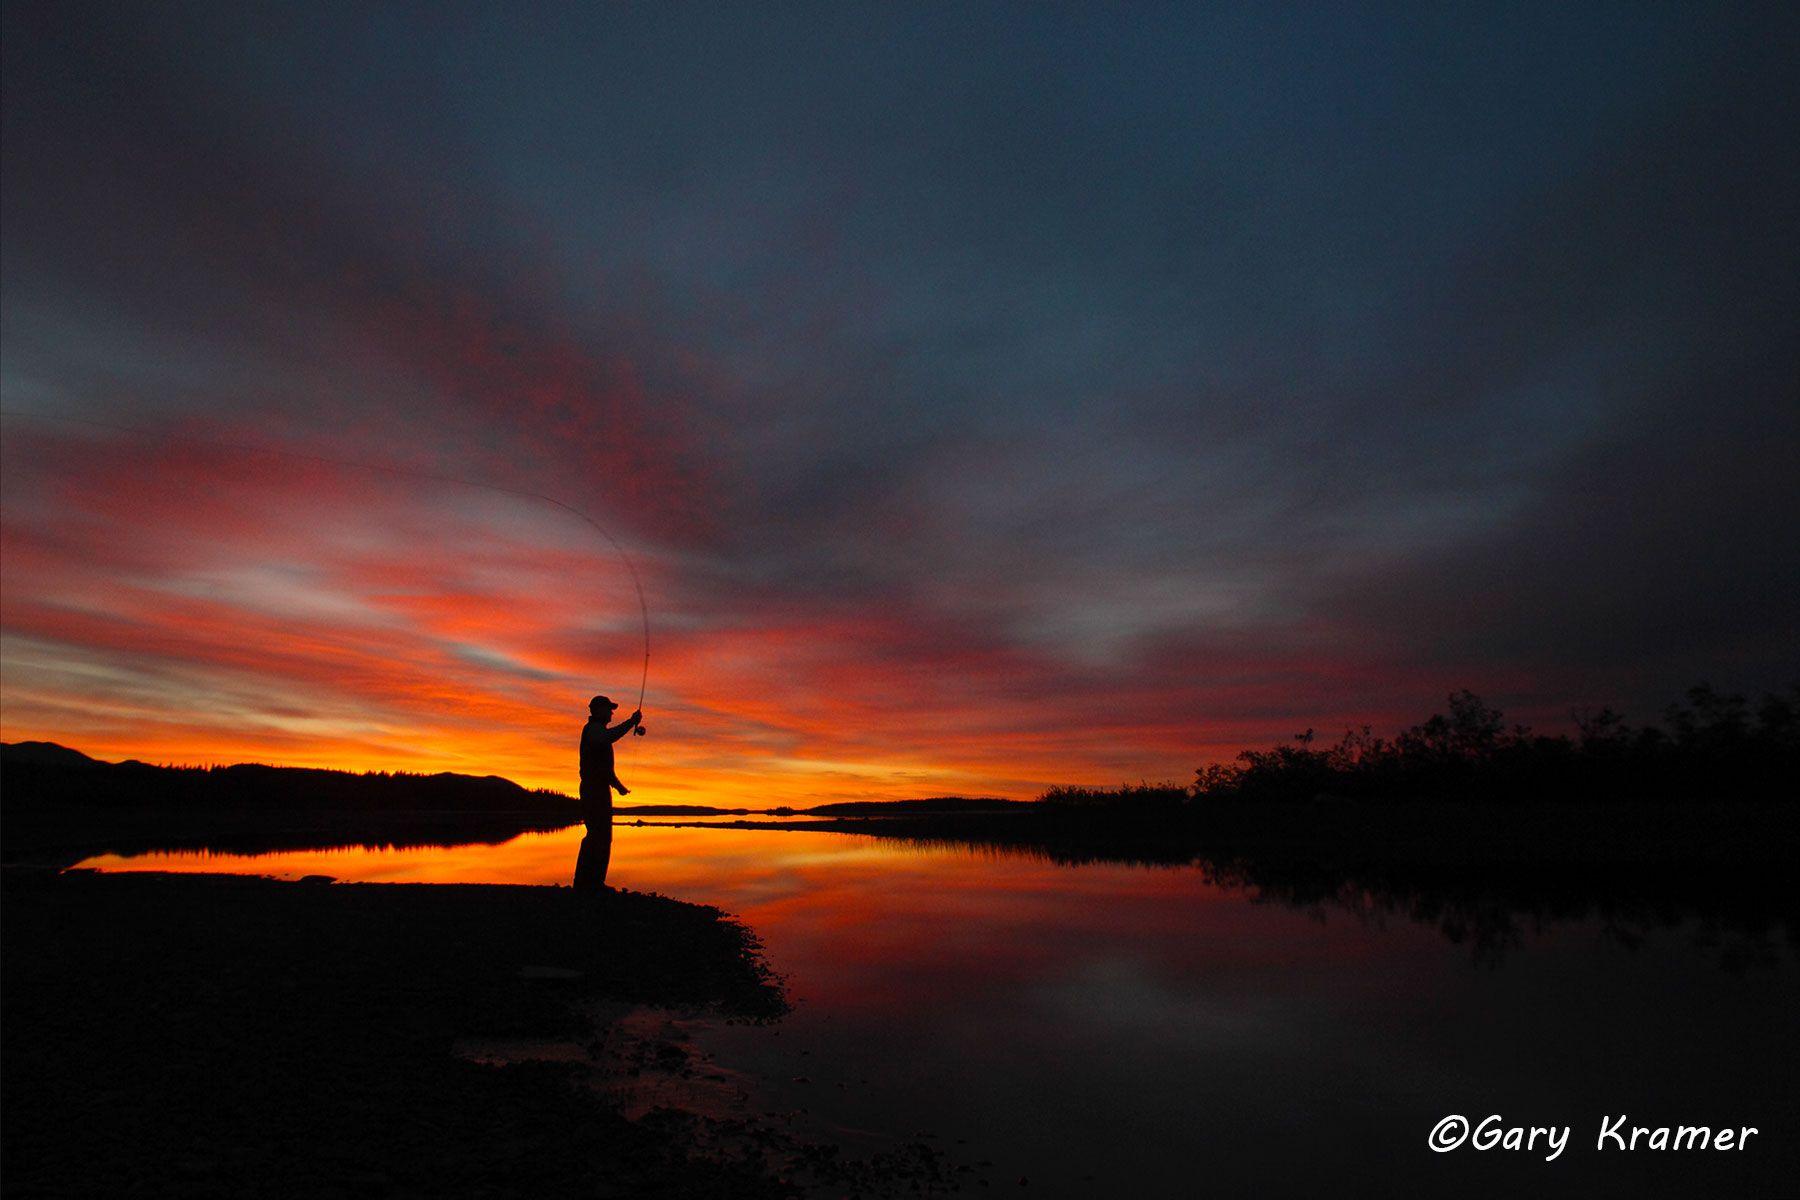 Fly Fishing at Sunset/Sunrise - GFS#135d